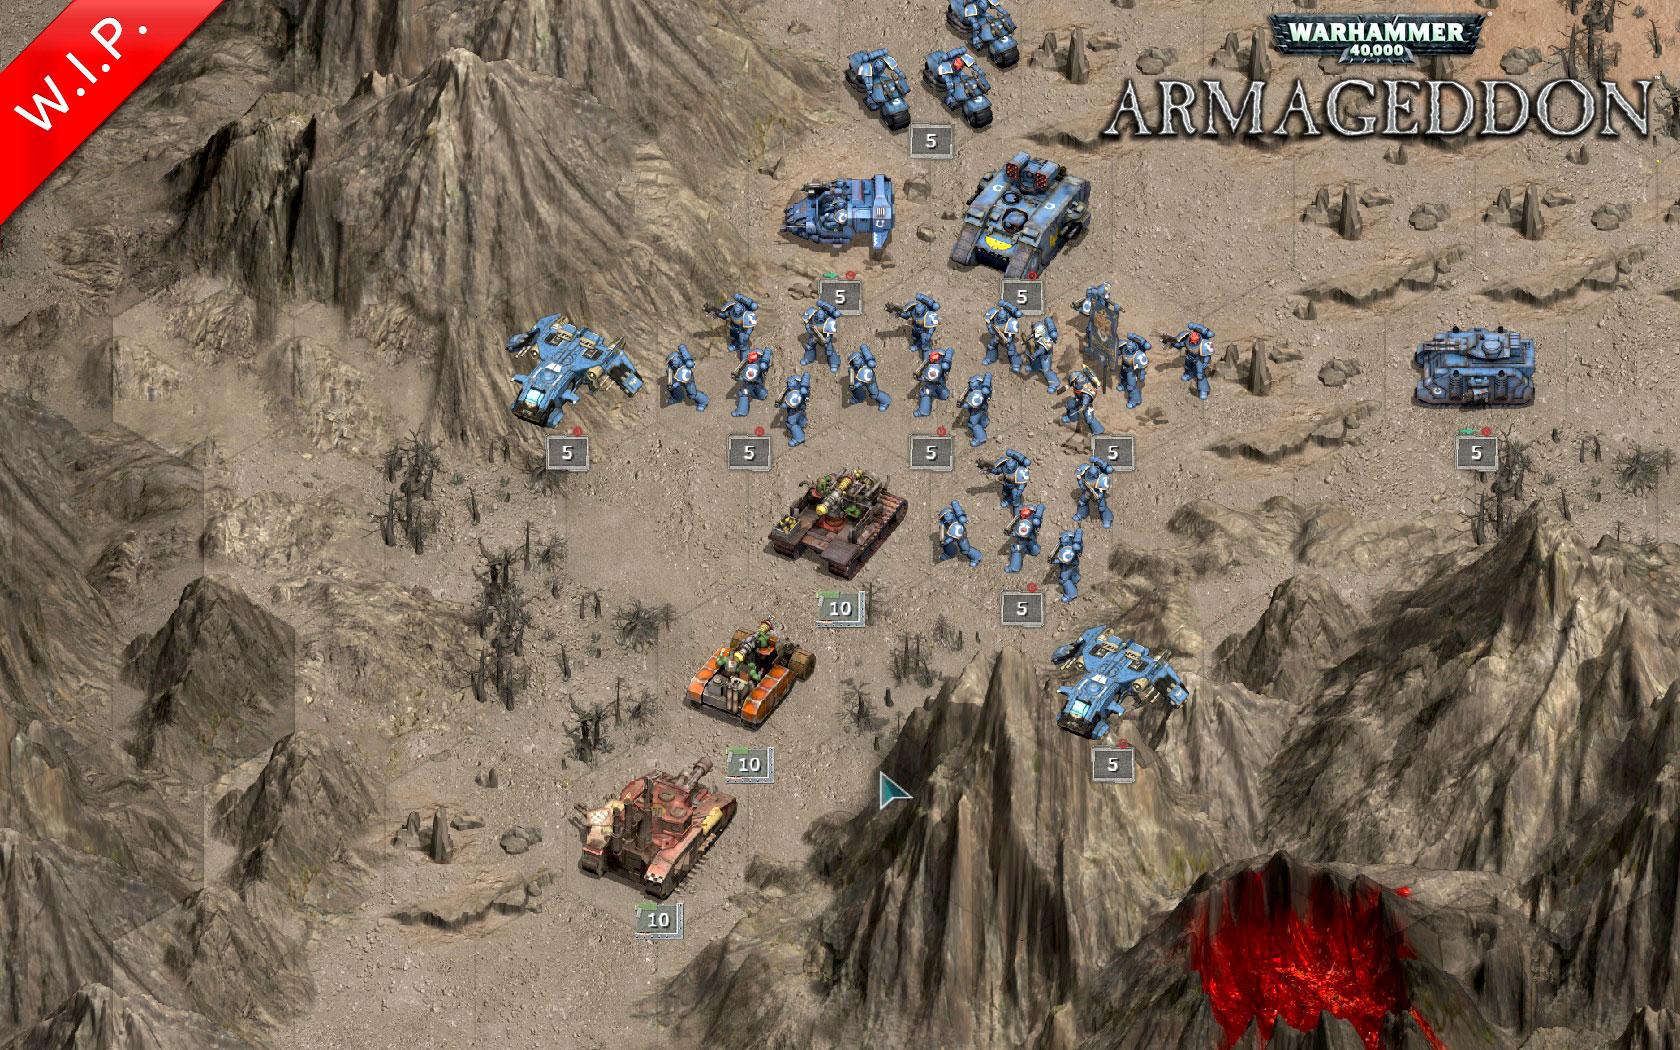 Warhammer 40.000 Armageddon arranca su fase beta